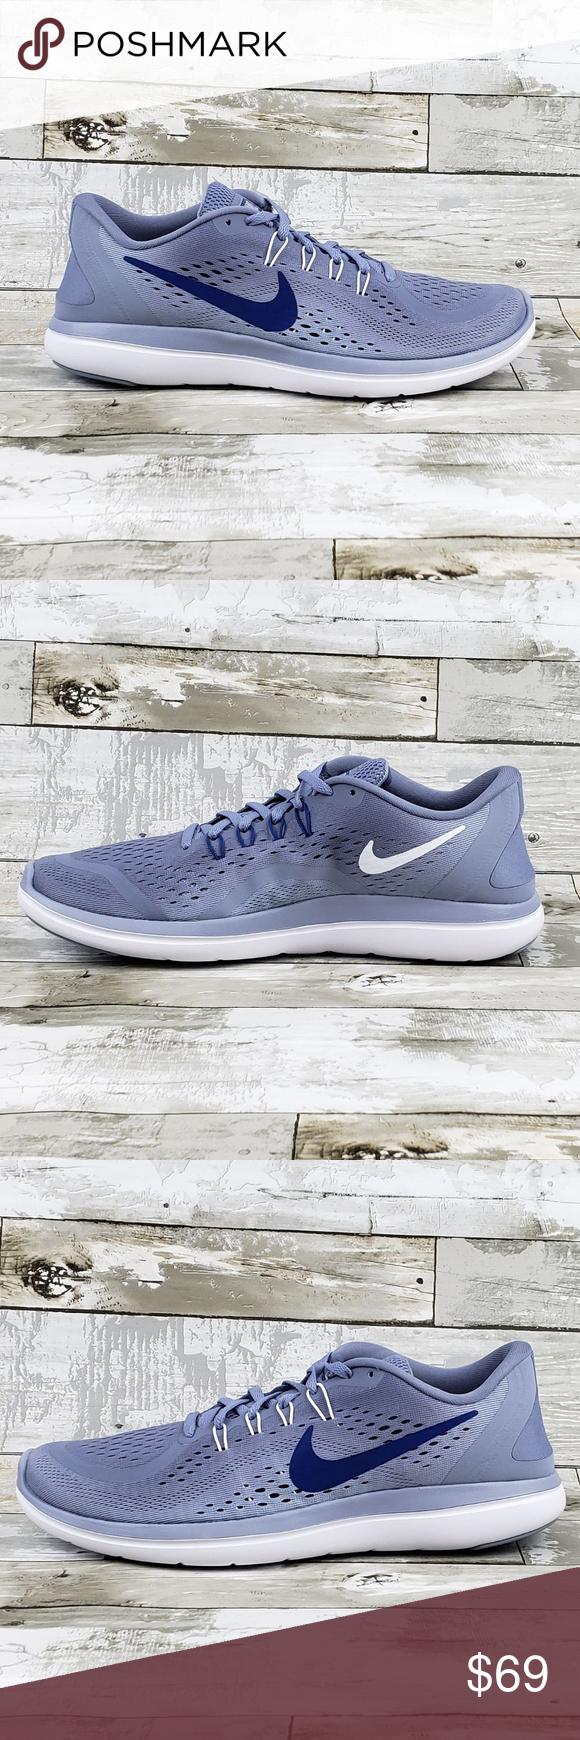 6a00b31e3431 Nike Flex 2017 RN Running Shoes Dark Sky Blue Nike Flex 2017 RN Running  Shoes Dark